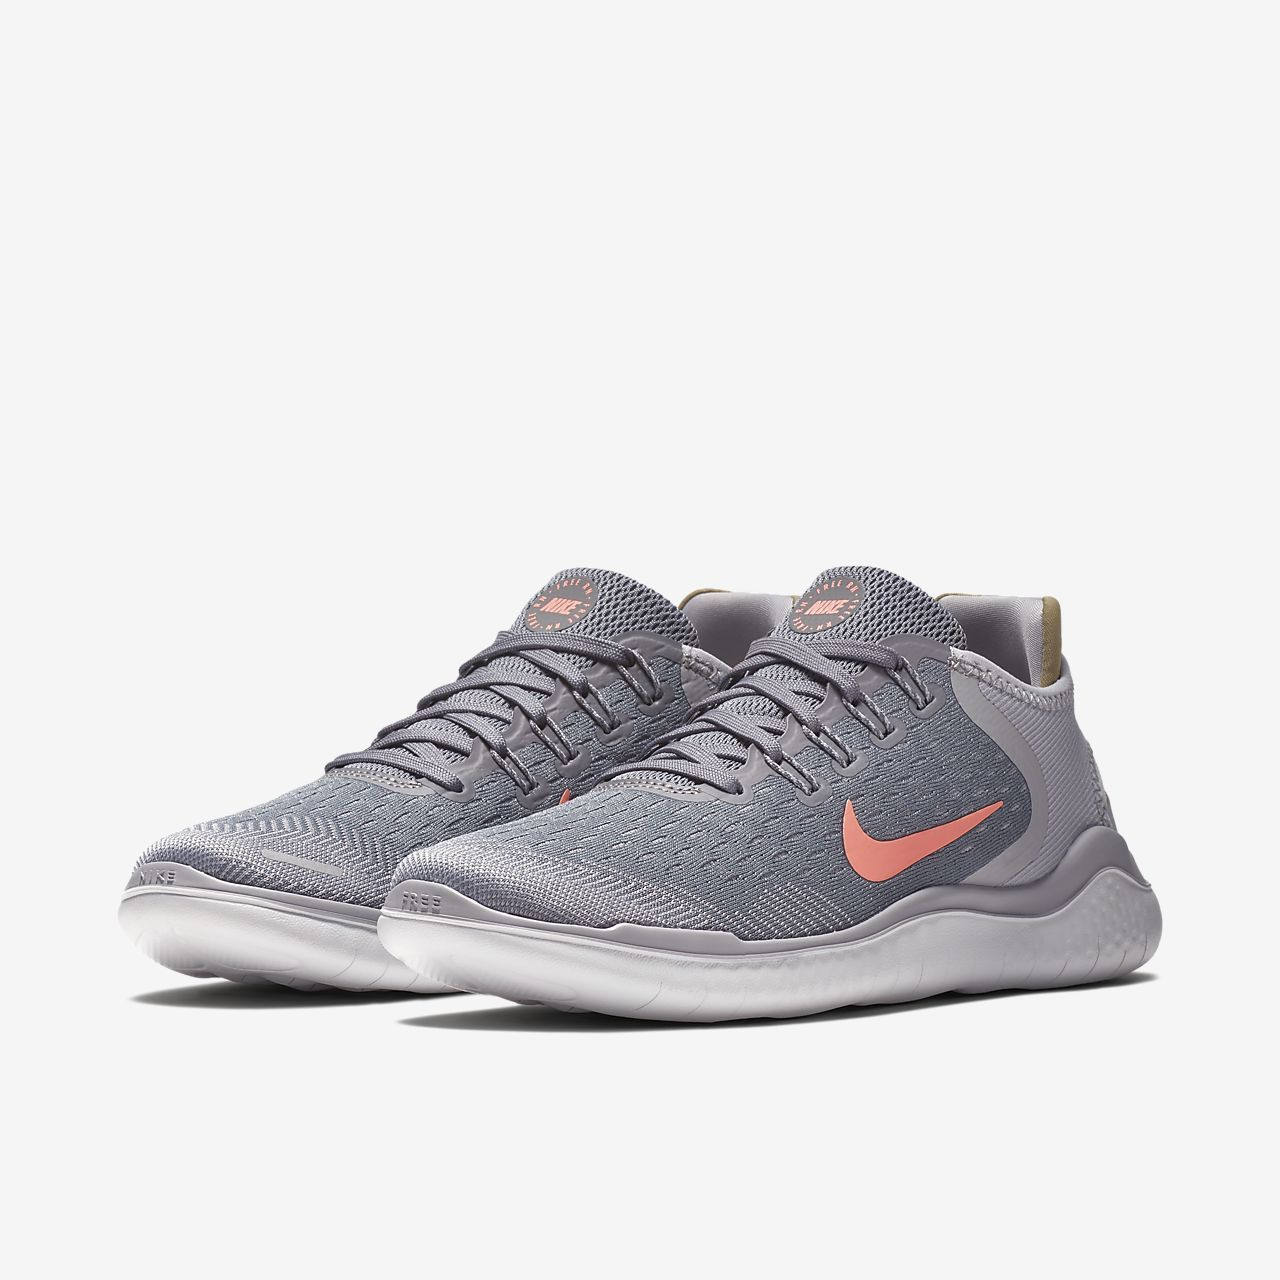 Tormenta mar Mediterráneo Chicle  Nike Free RN 2018 Women's Running Shoe. Nike.com   Running shoes nike free, Womens  running shoes, Nike shoes women